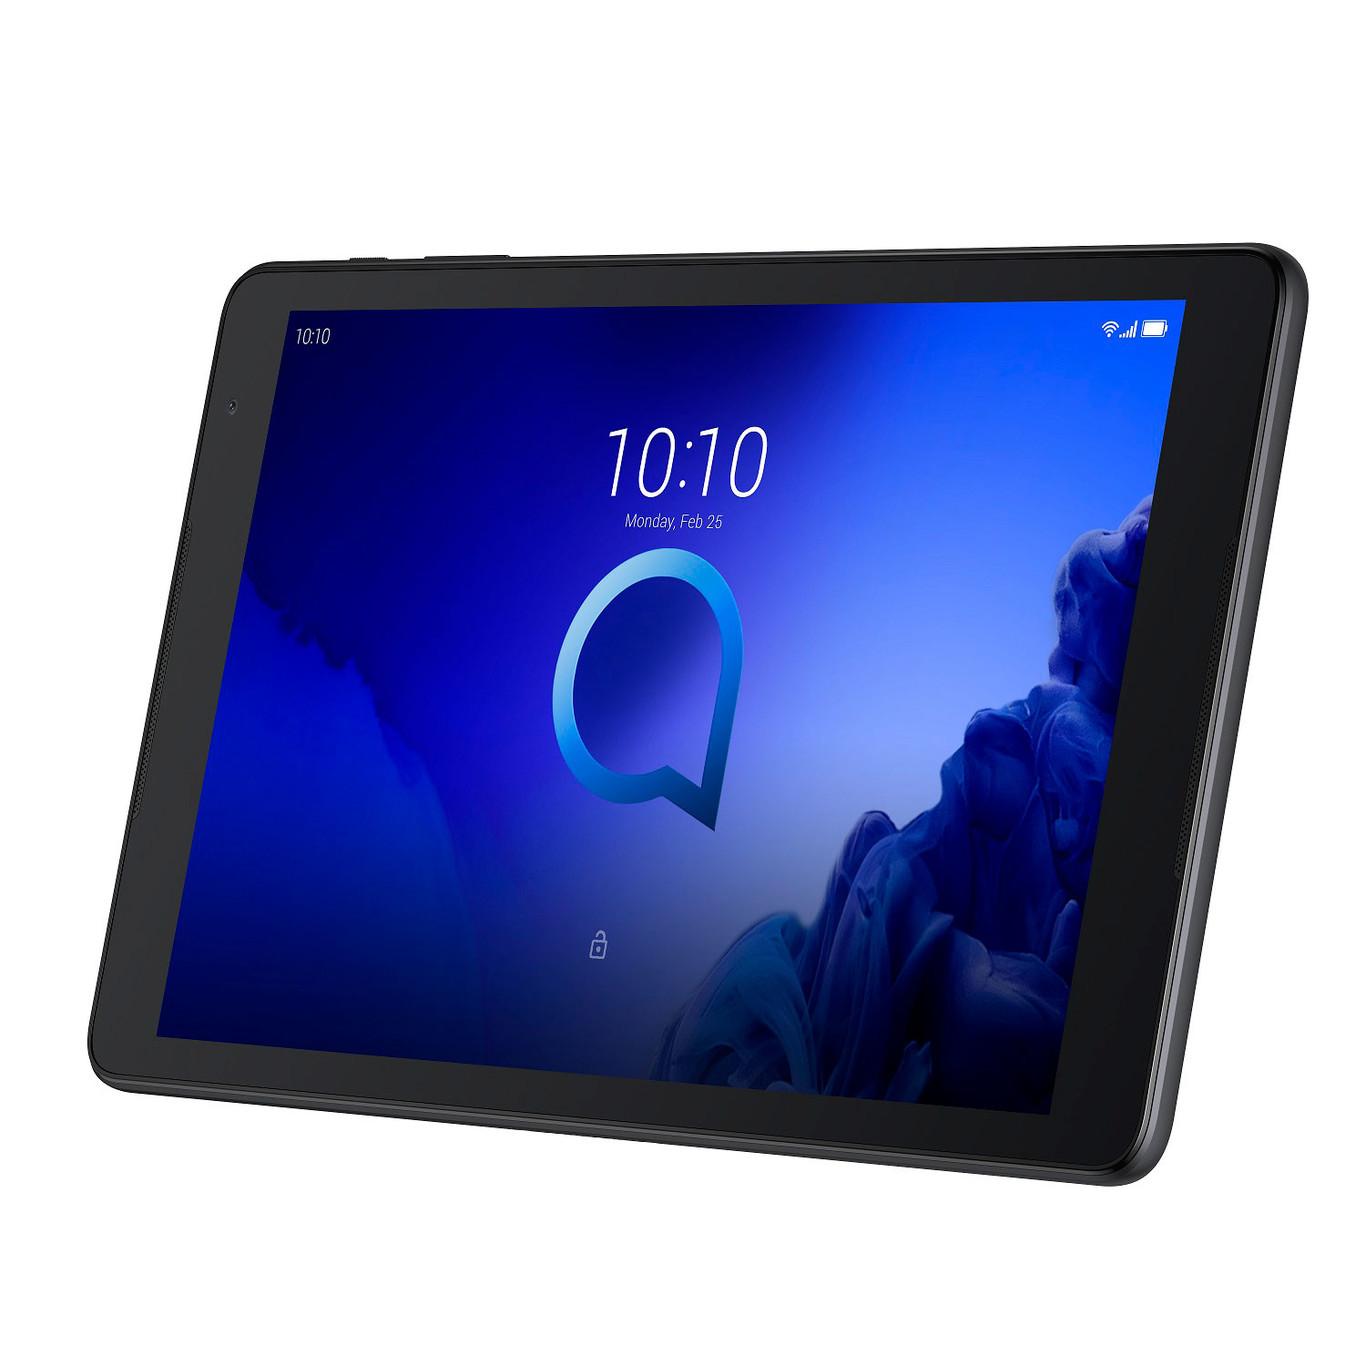 TABLET ALCATEL 3T10 8094M PANTALLA 10P 4G LTE RAM 2GB ROM 32GB AMDROID 10 USB TIPO C DUALCAM 5MP 2AOFUS11